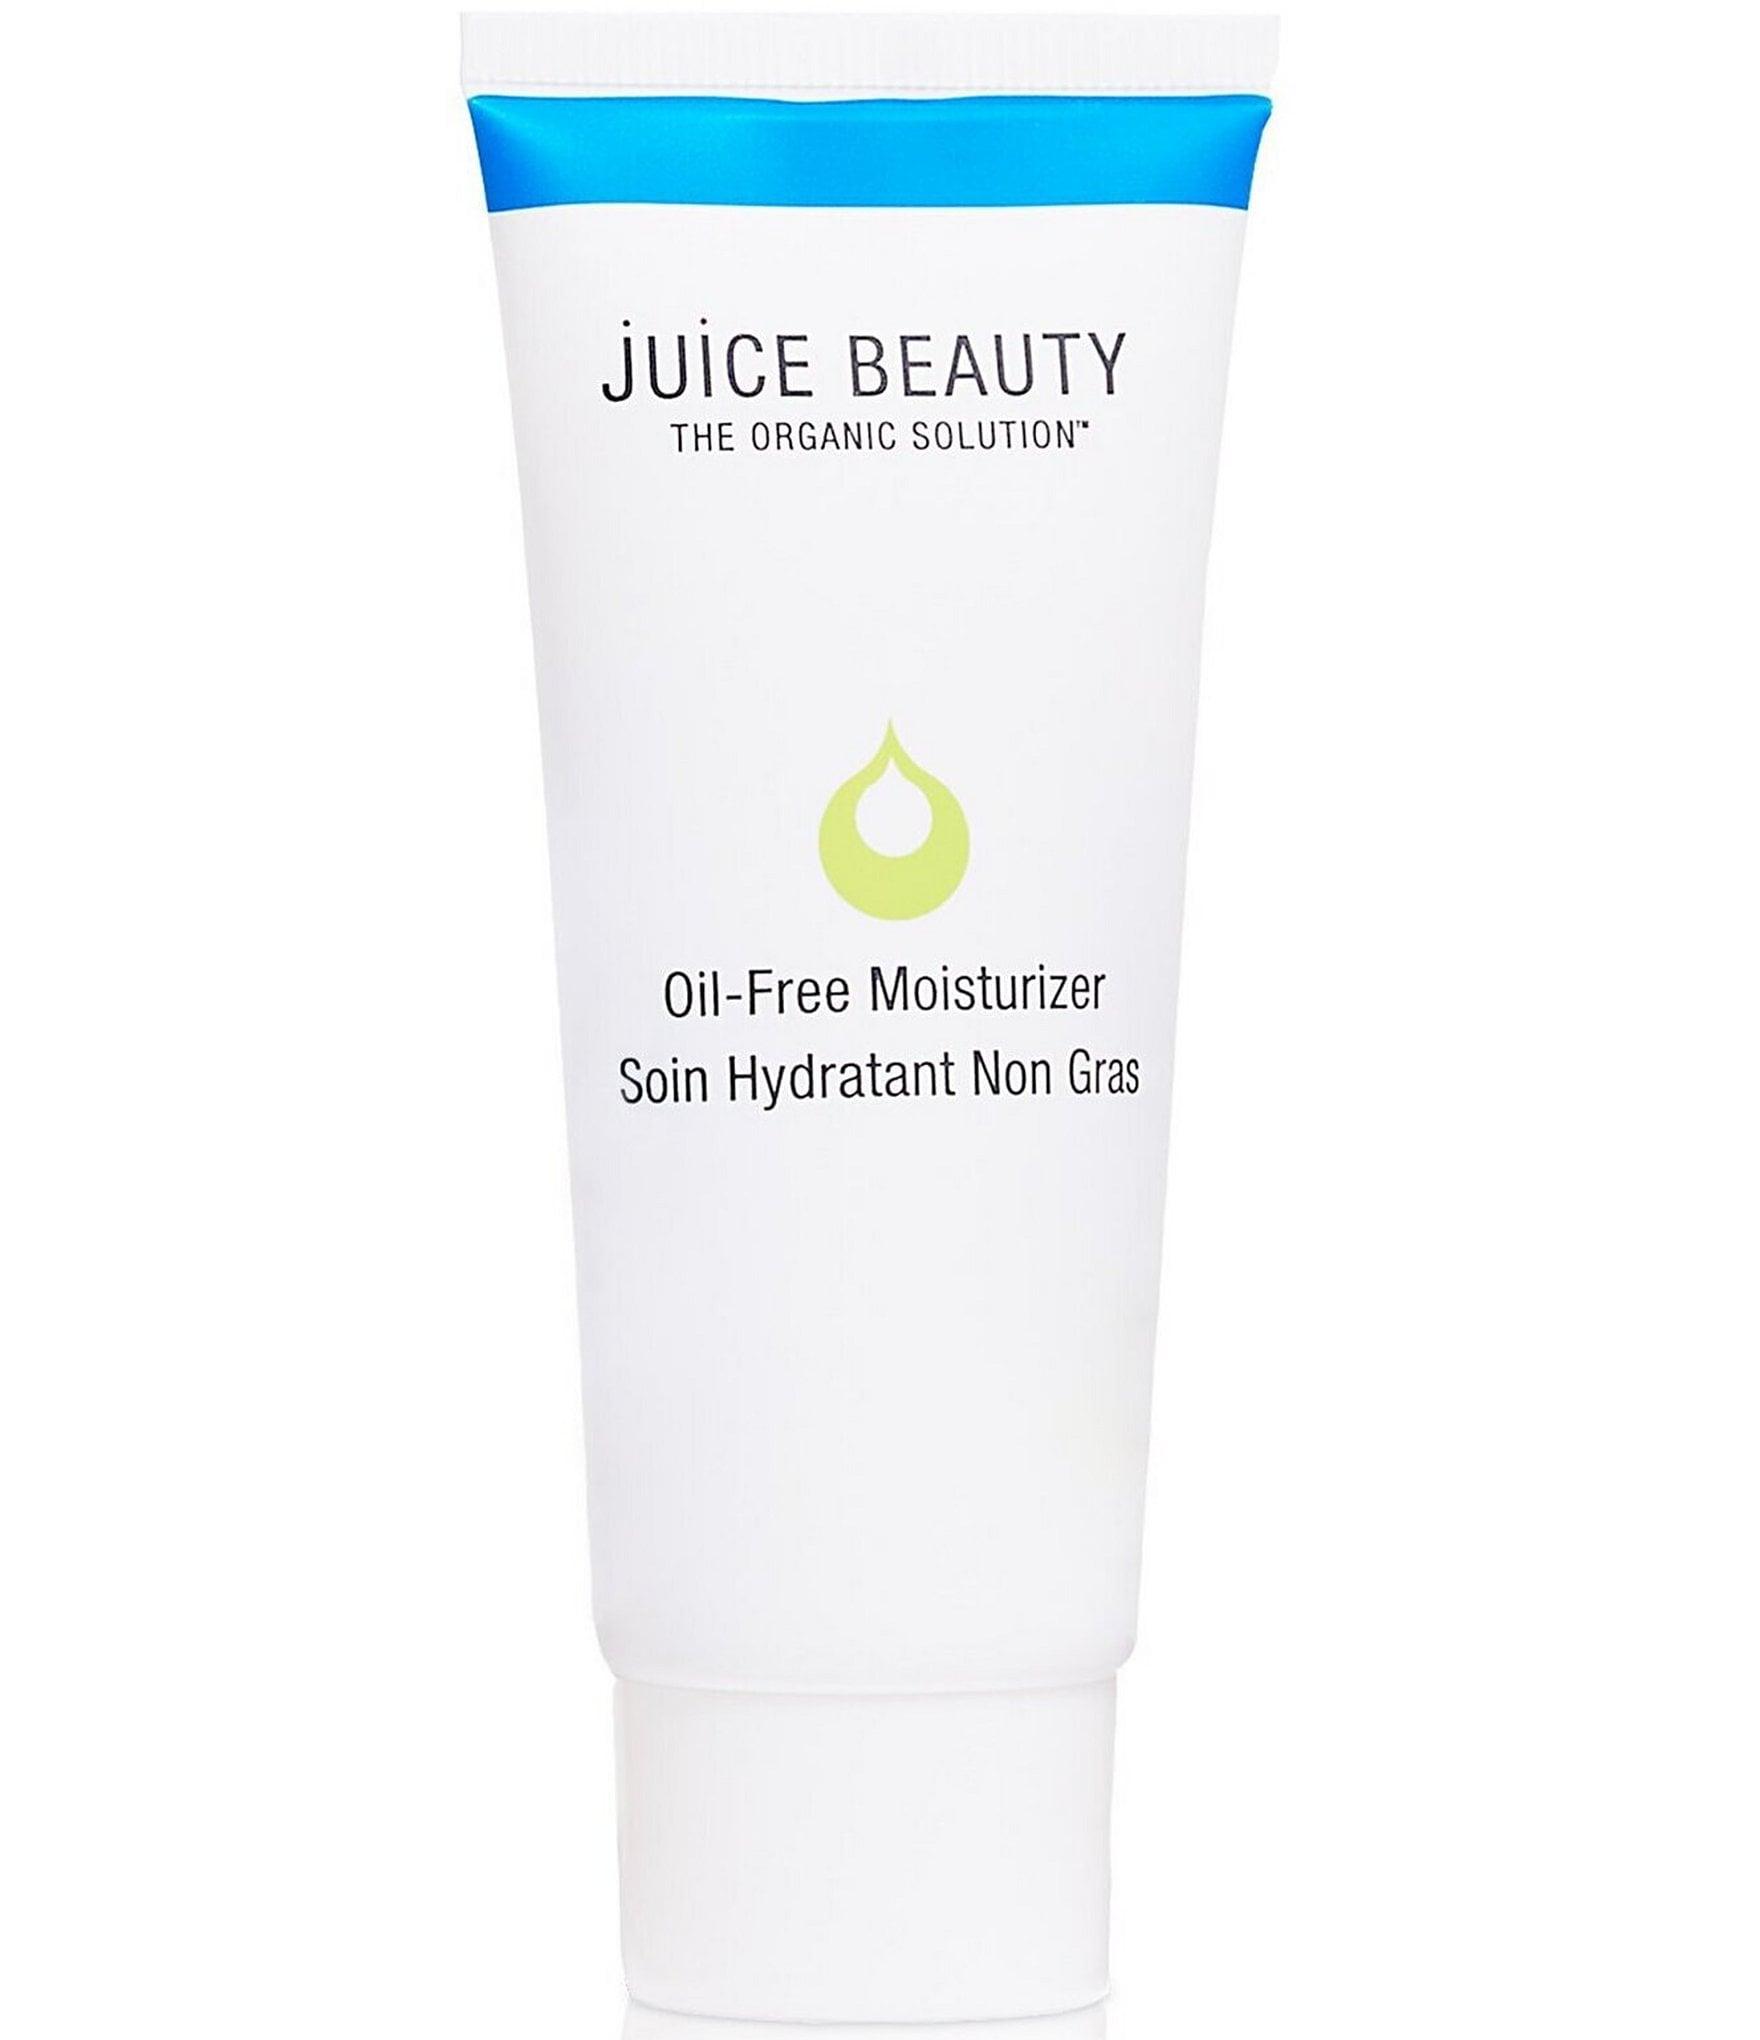 Juice beauty oil free moisturizer review